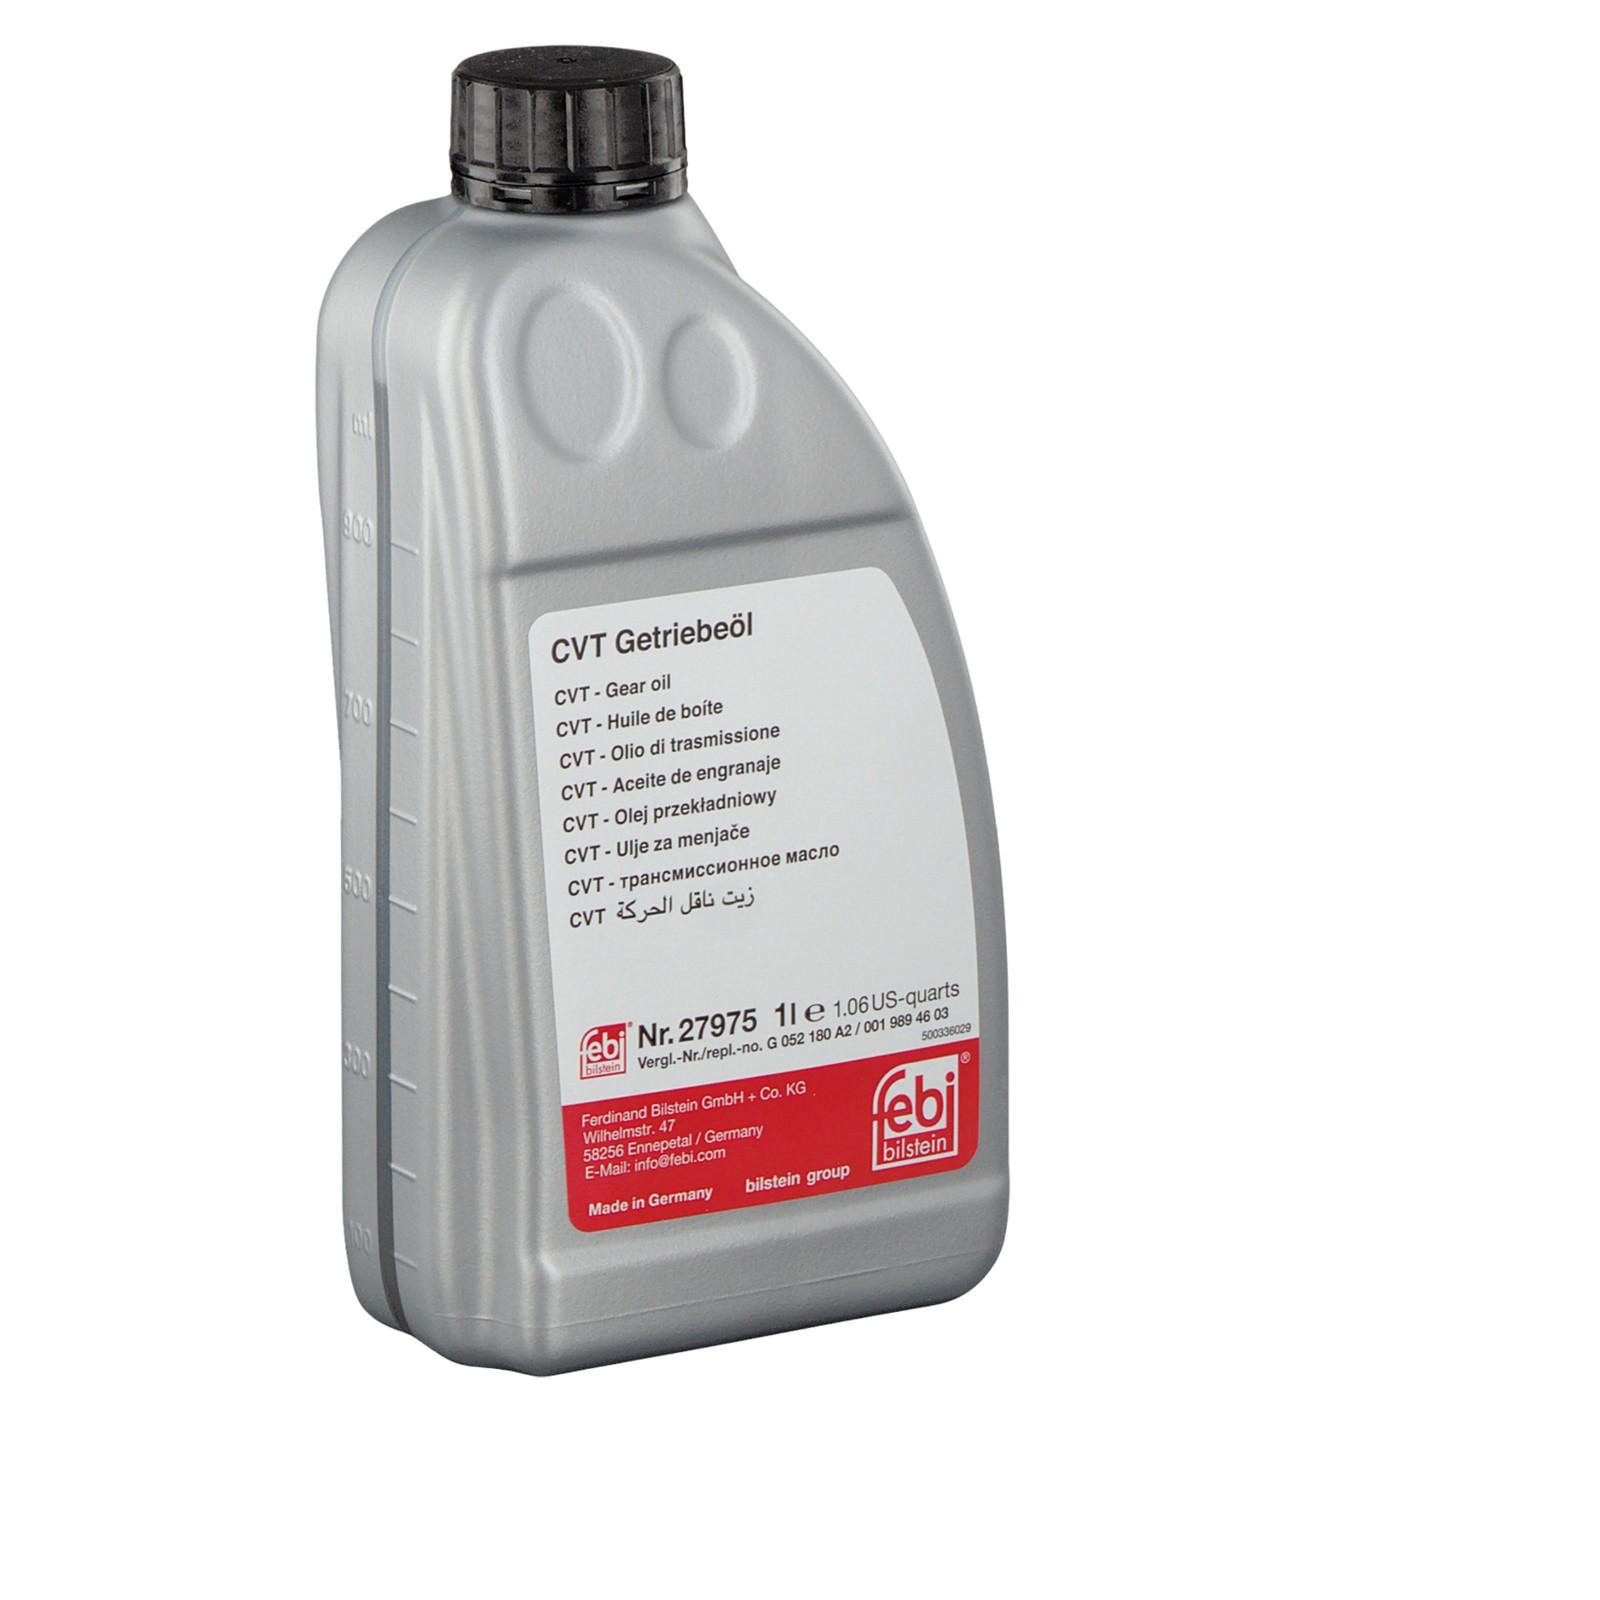 FEBI Hydraulikfilter + 7L Getriebeöl 0AW CVT-Multitronic AUDI A4 B8 A5 8T 8F A6 C7 A7 4G